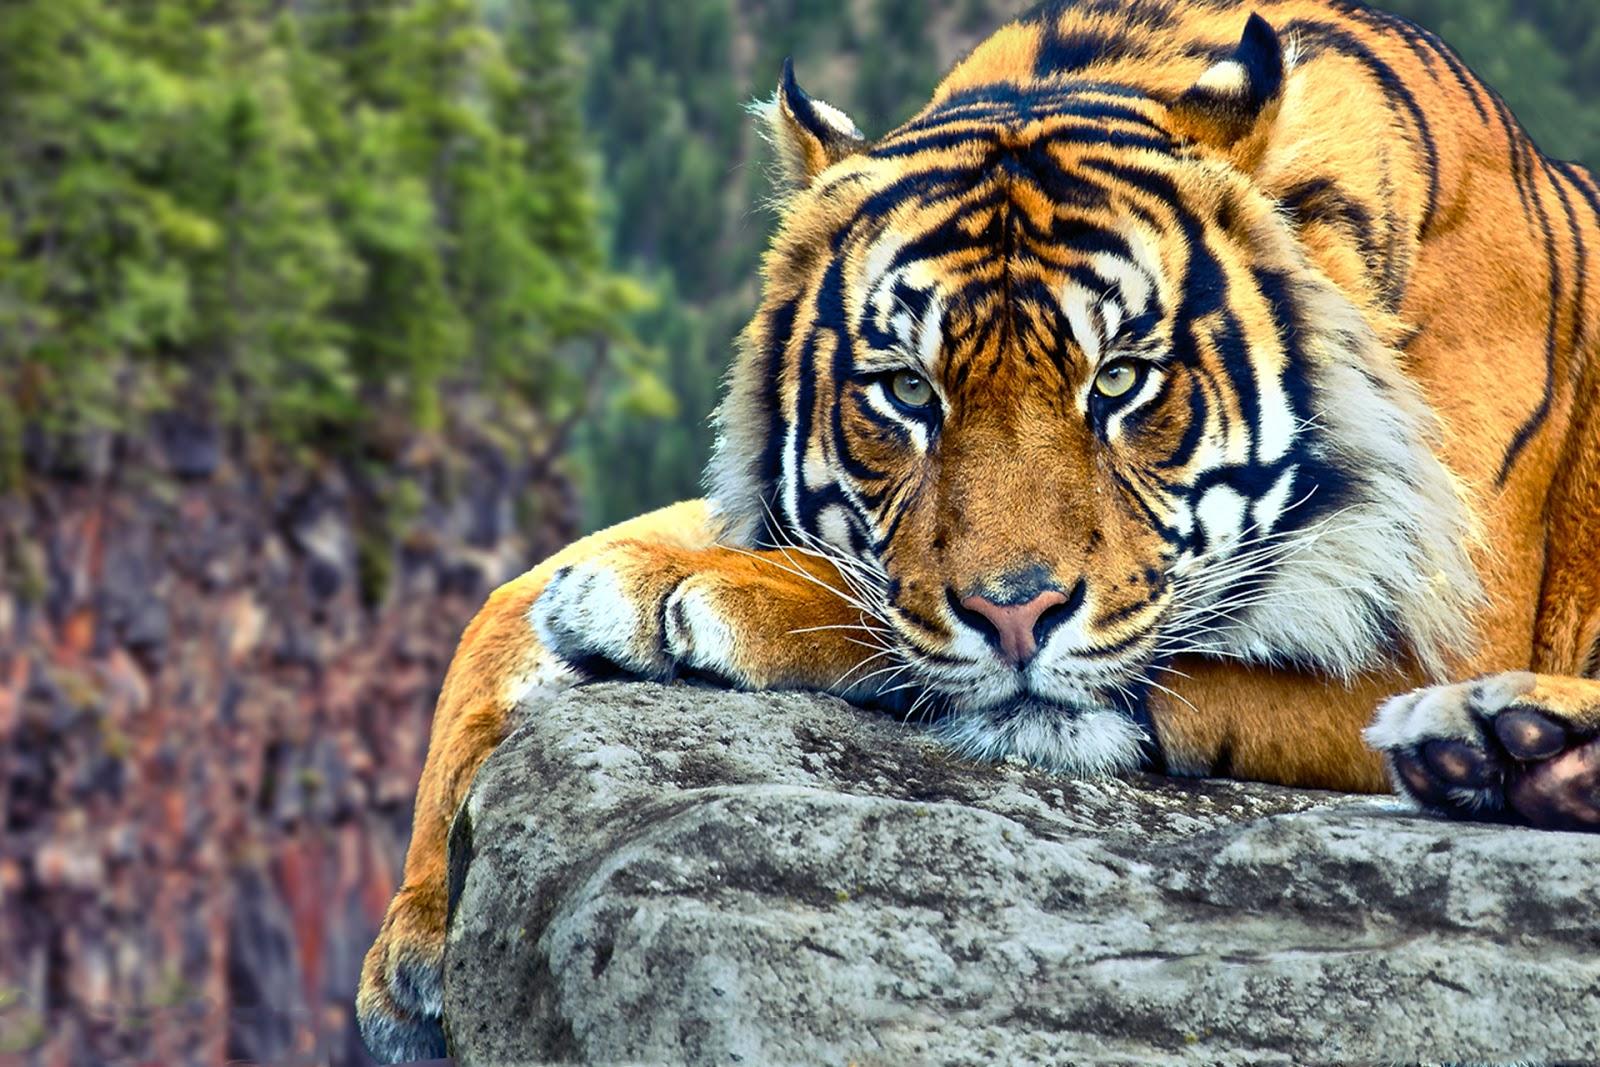 Wildlife of the World Tiger Desktop Wallpapers HD 1600x1067